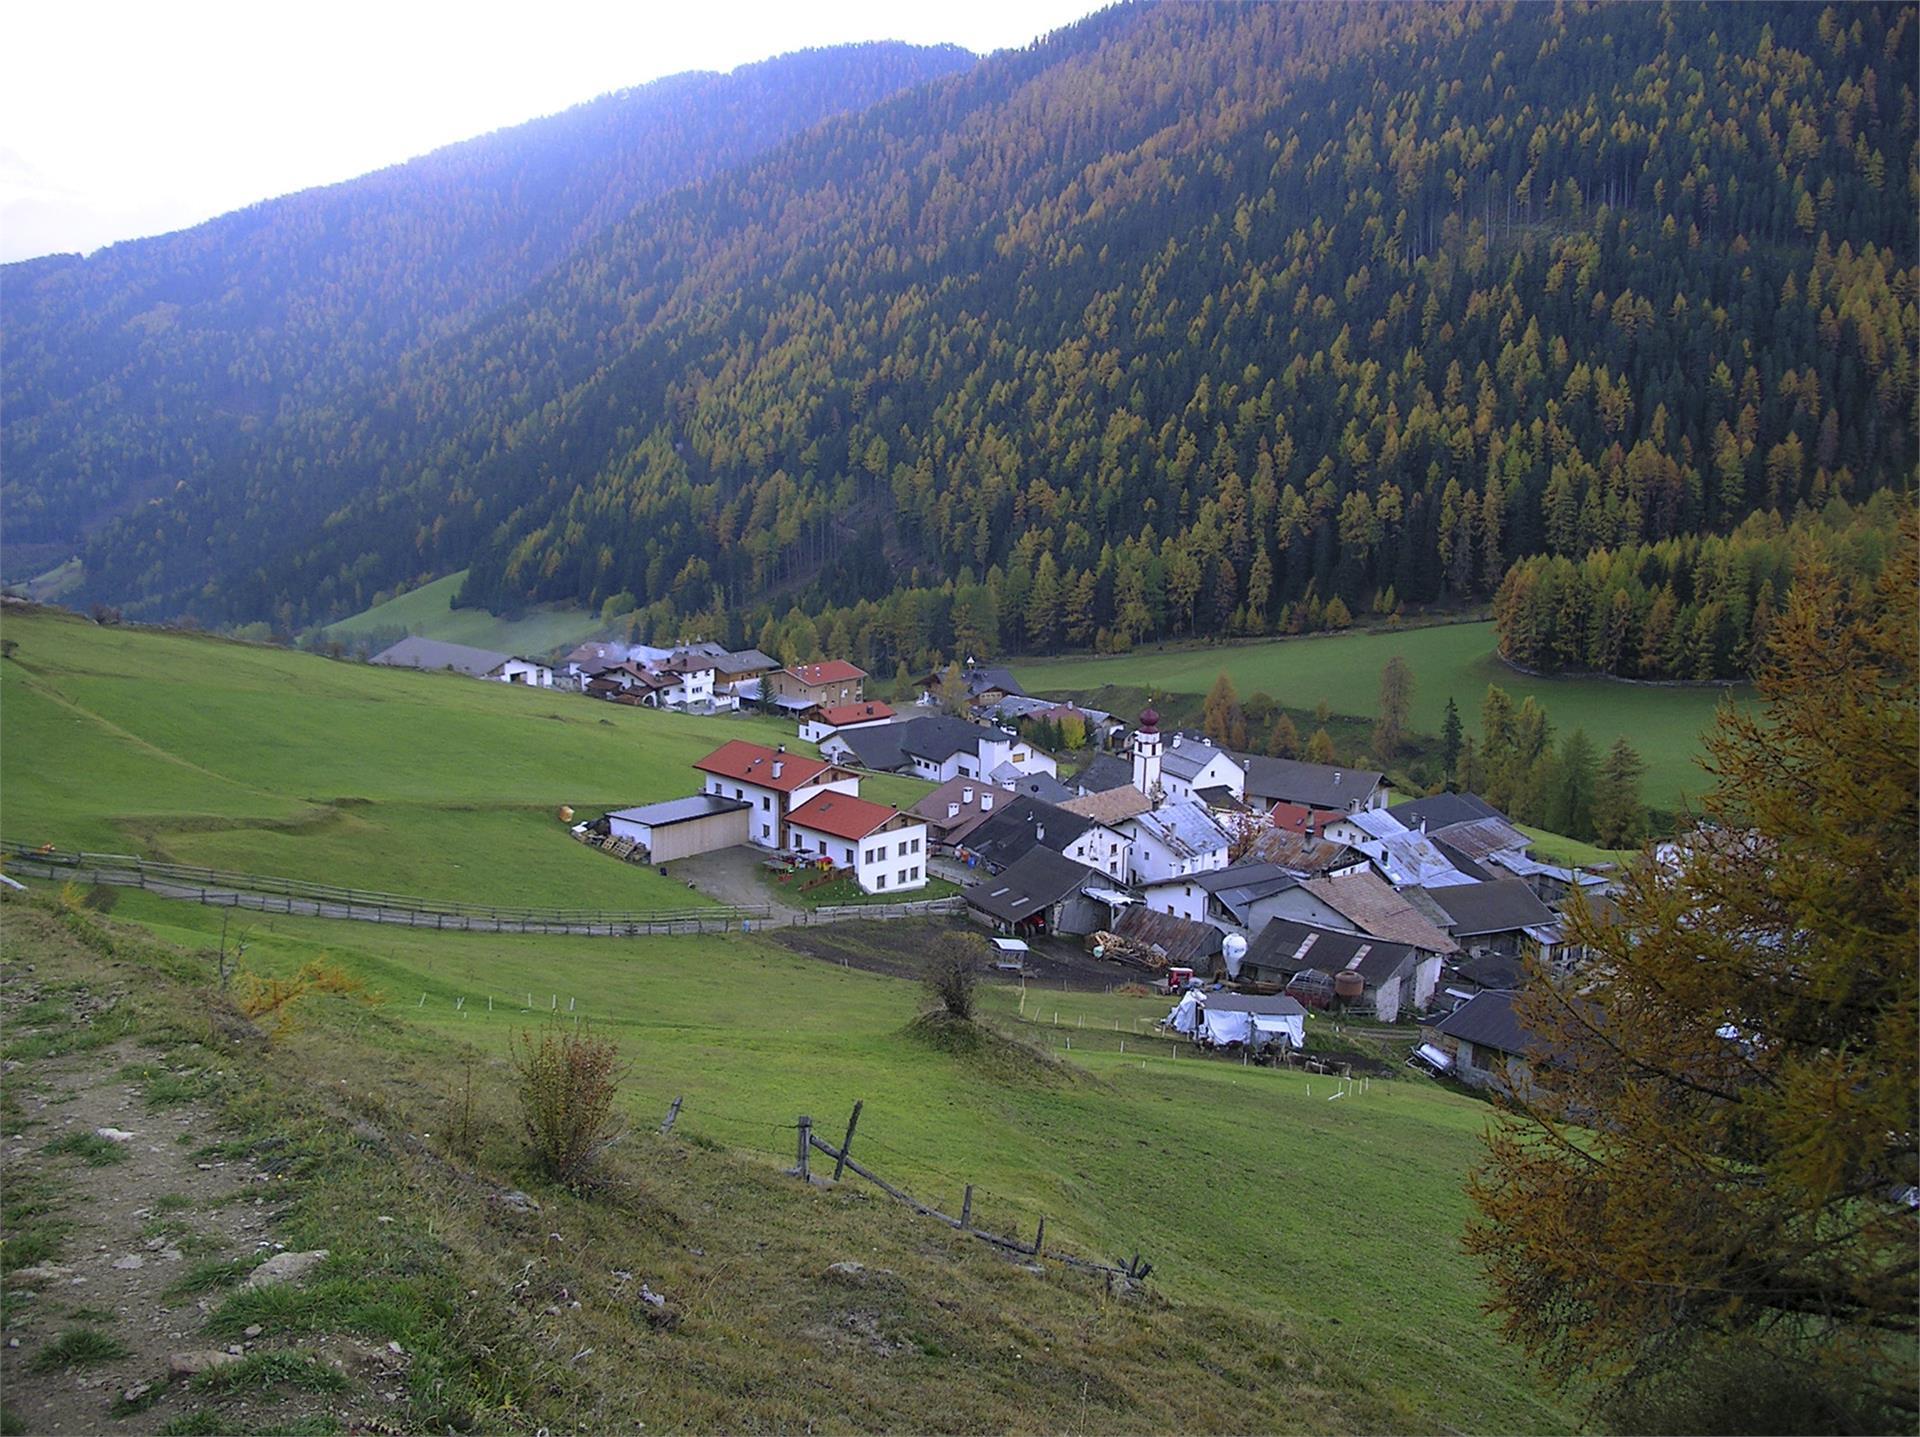 Ökohotel Edelweiß